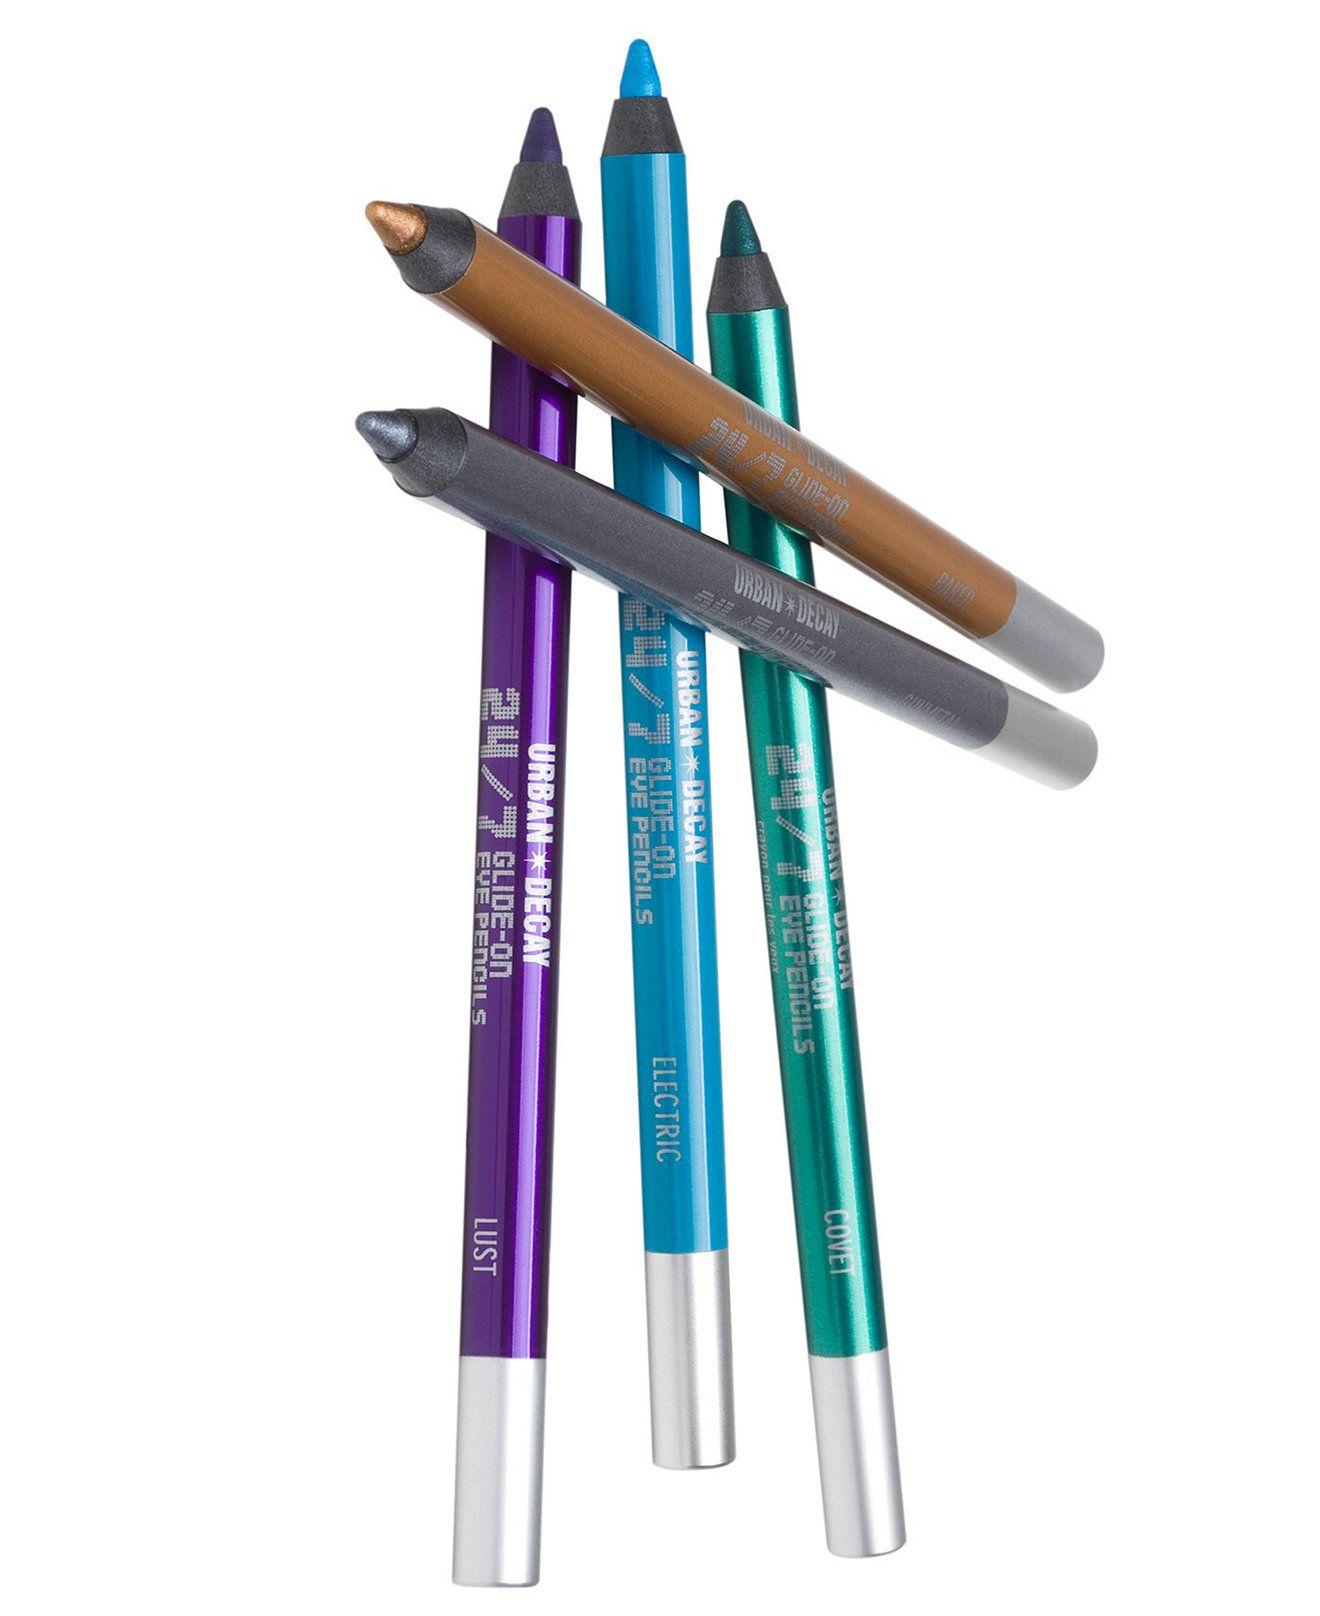 24/7 GlideOn Eye Pencil Makeup brush set, Urban decay